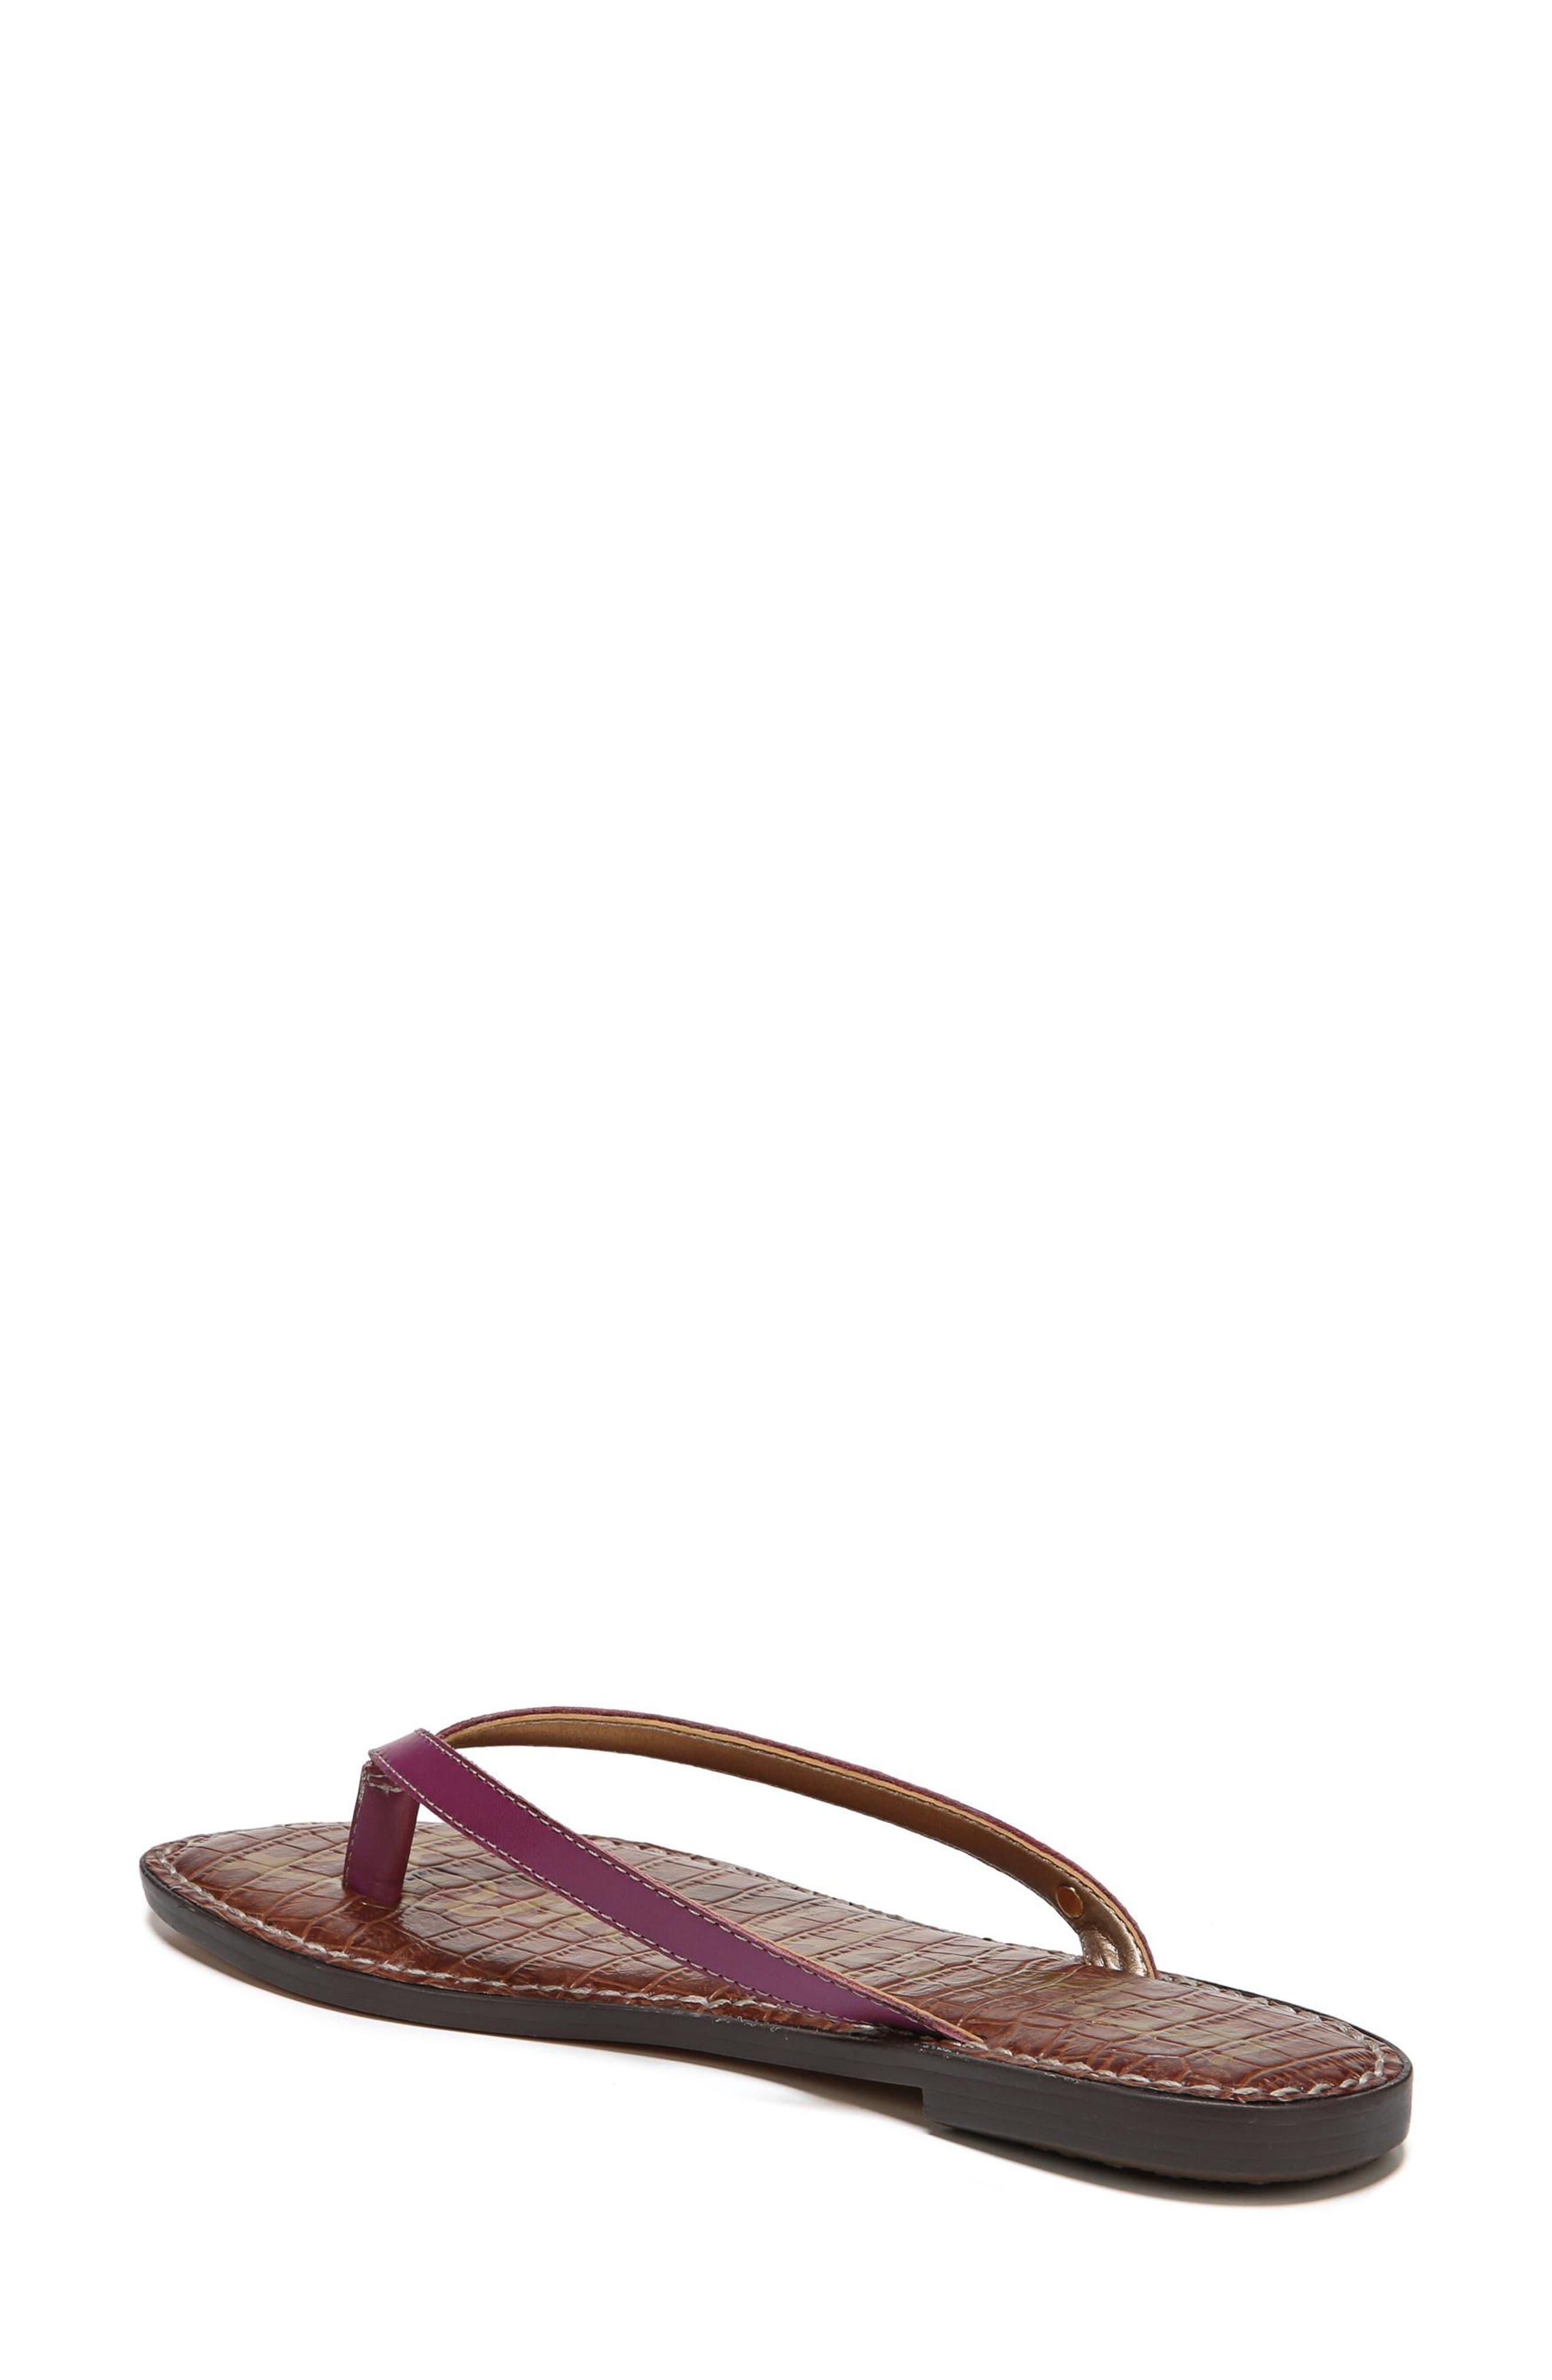 Alternate Image 2  - Sam Edelman 'Gracie' Sandal